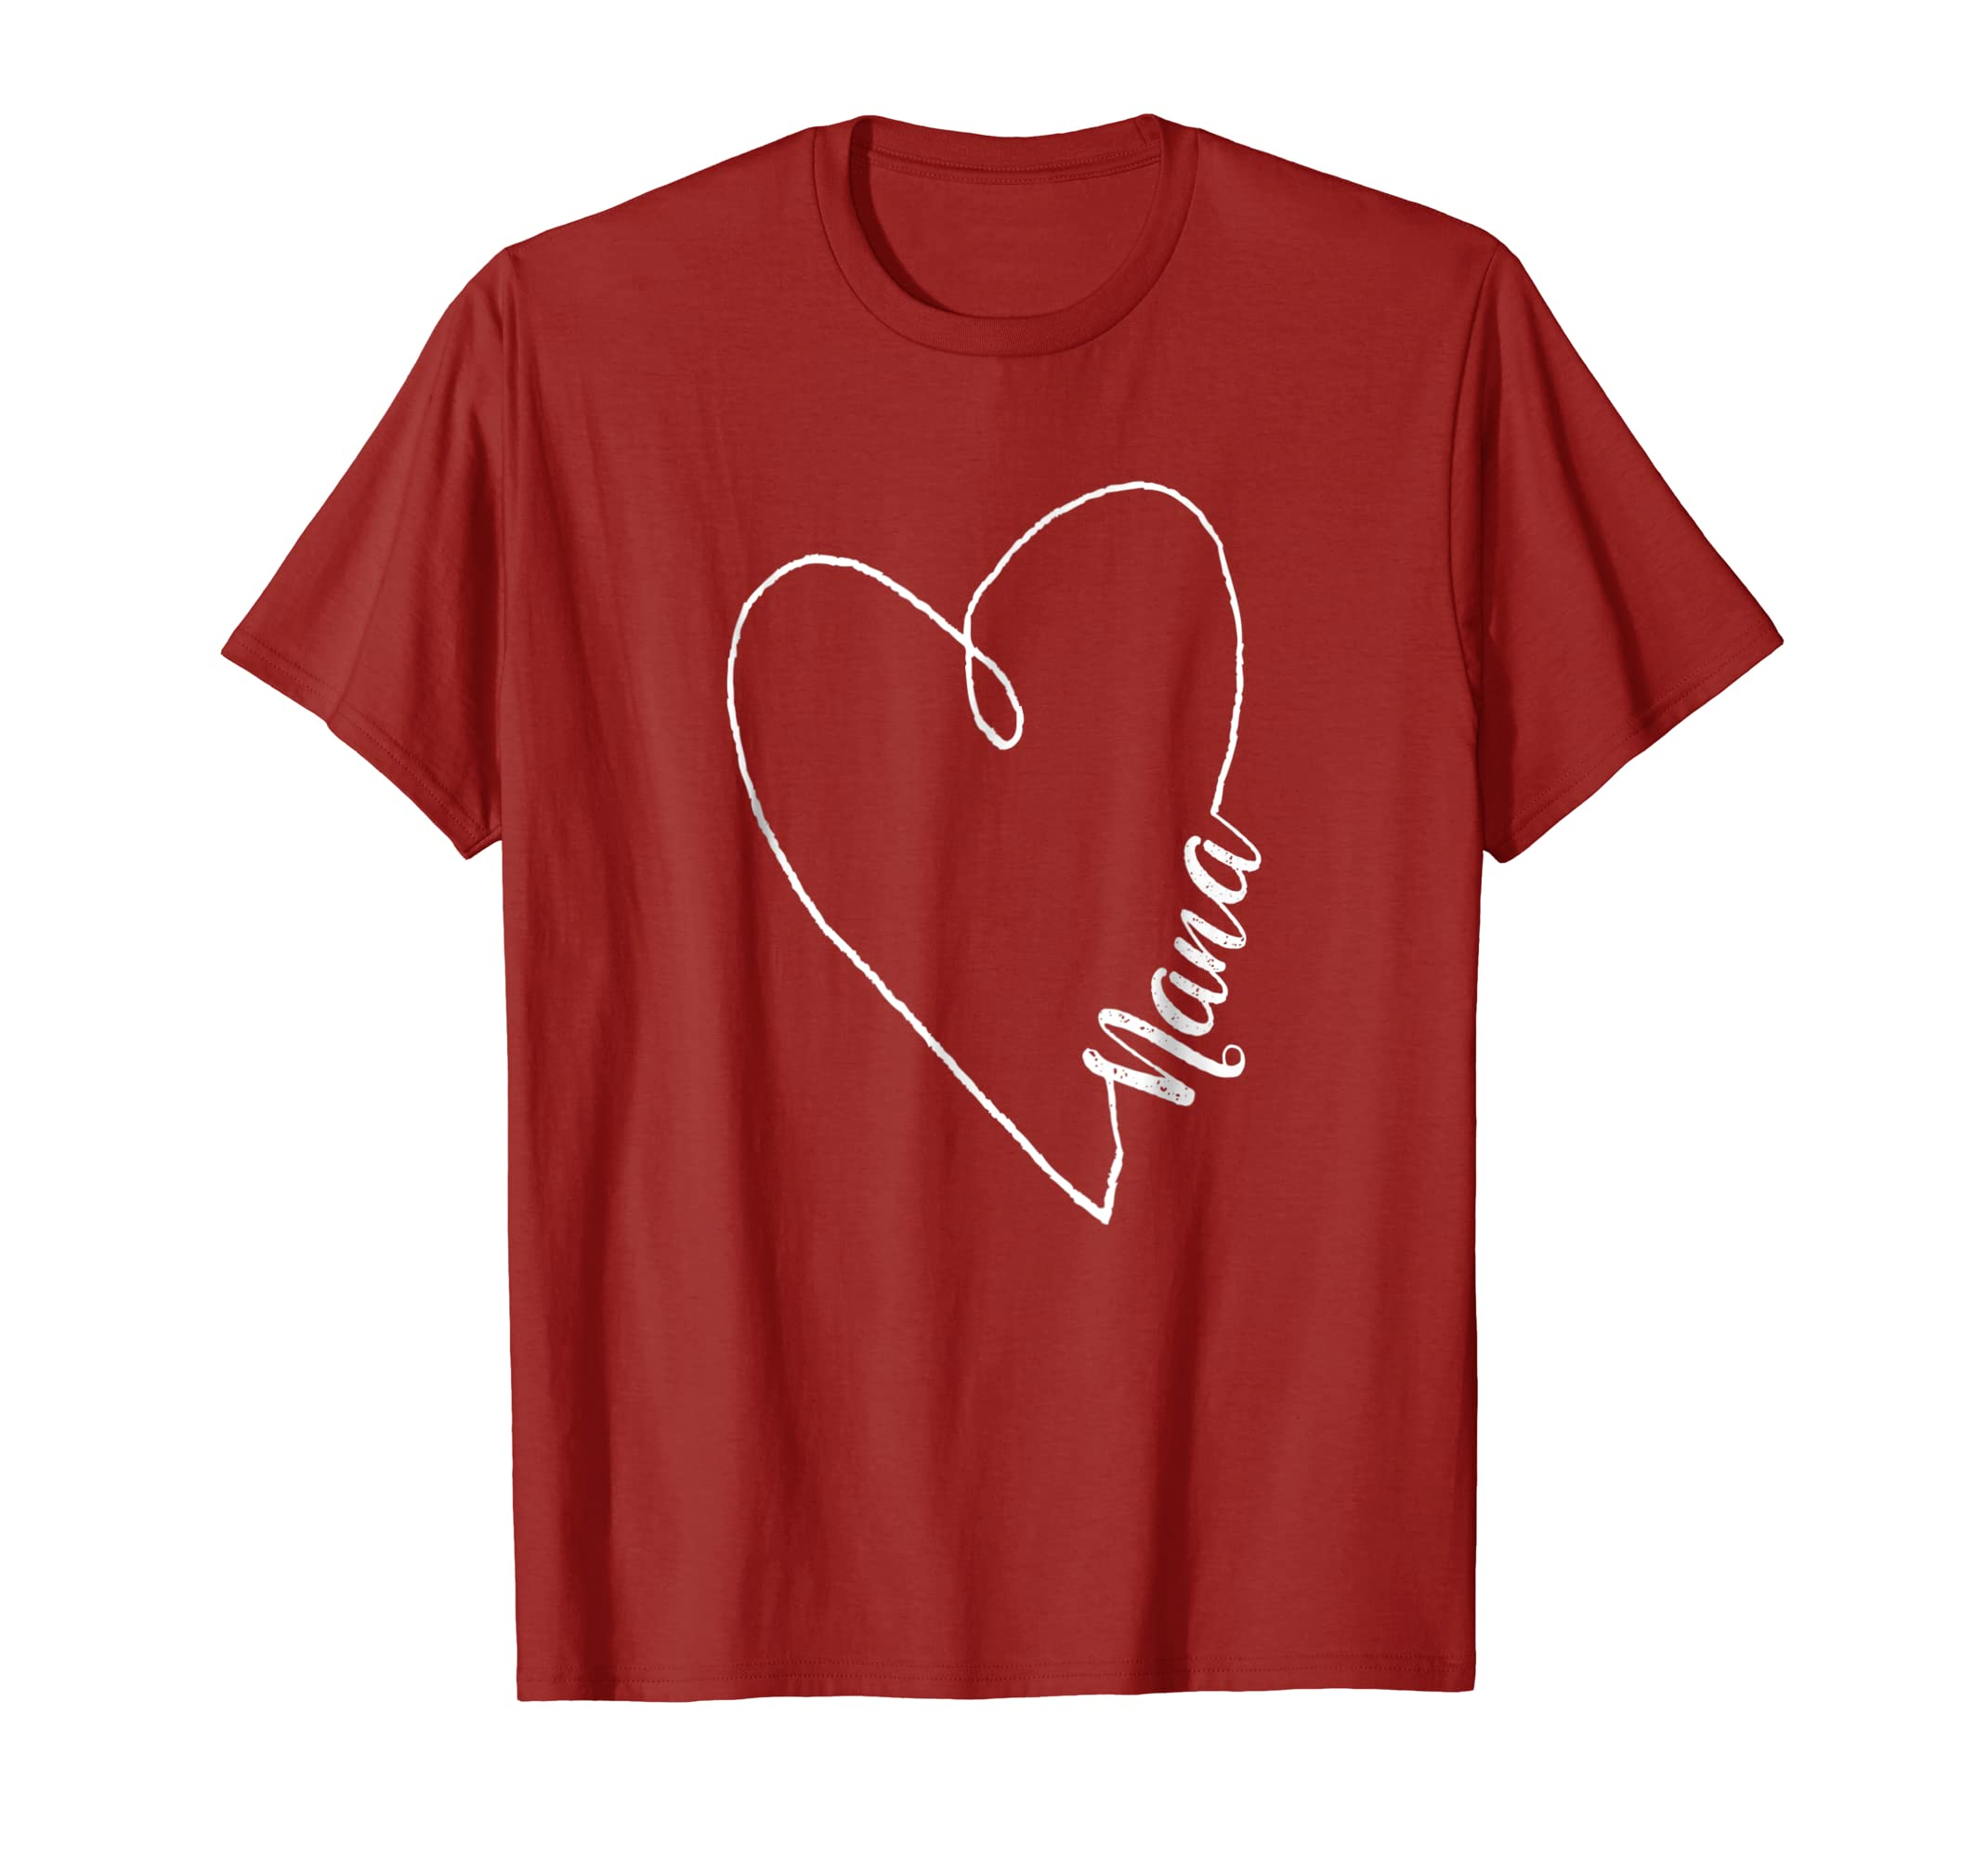 Nana Heart Shirt Light Mother Day Gift-Yolotee